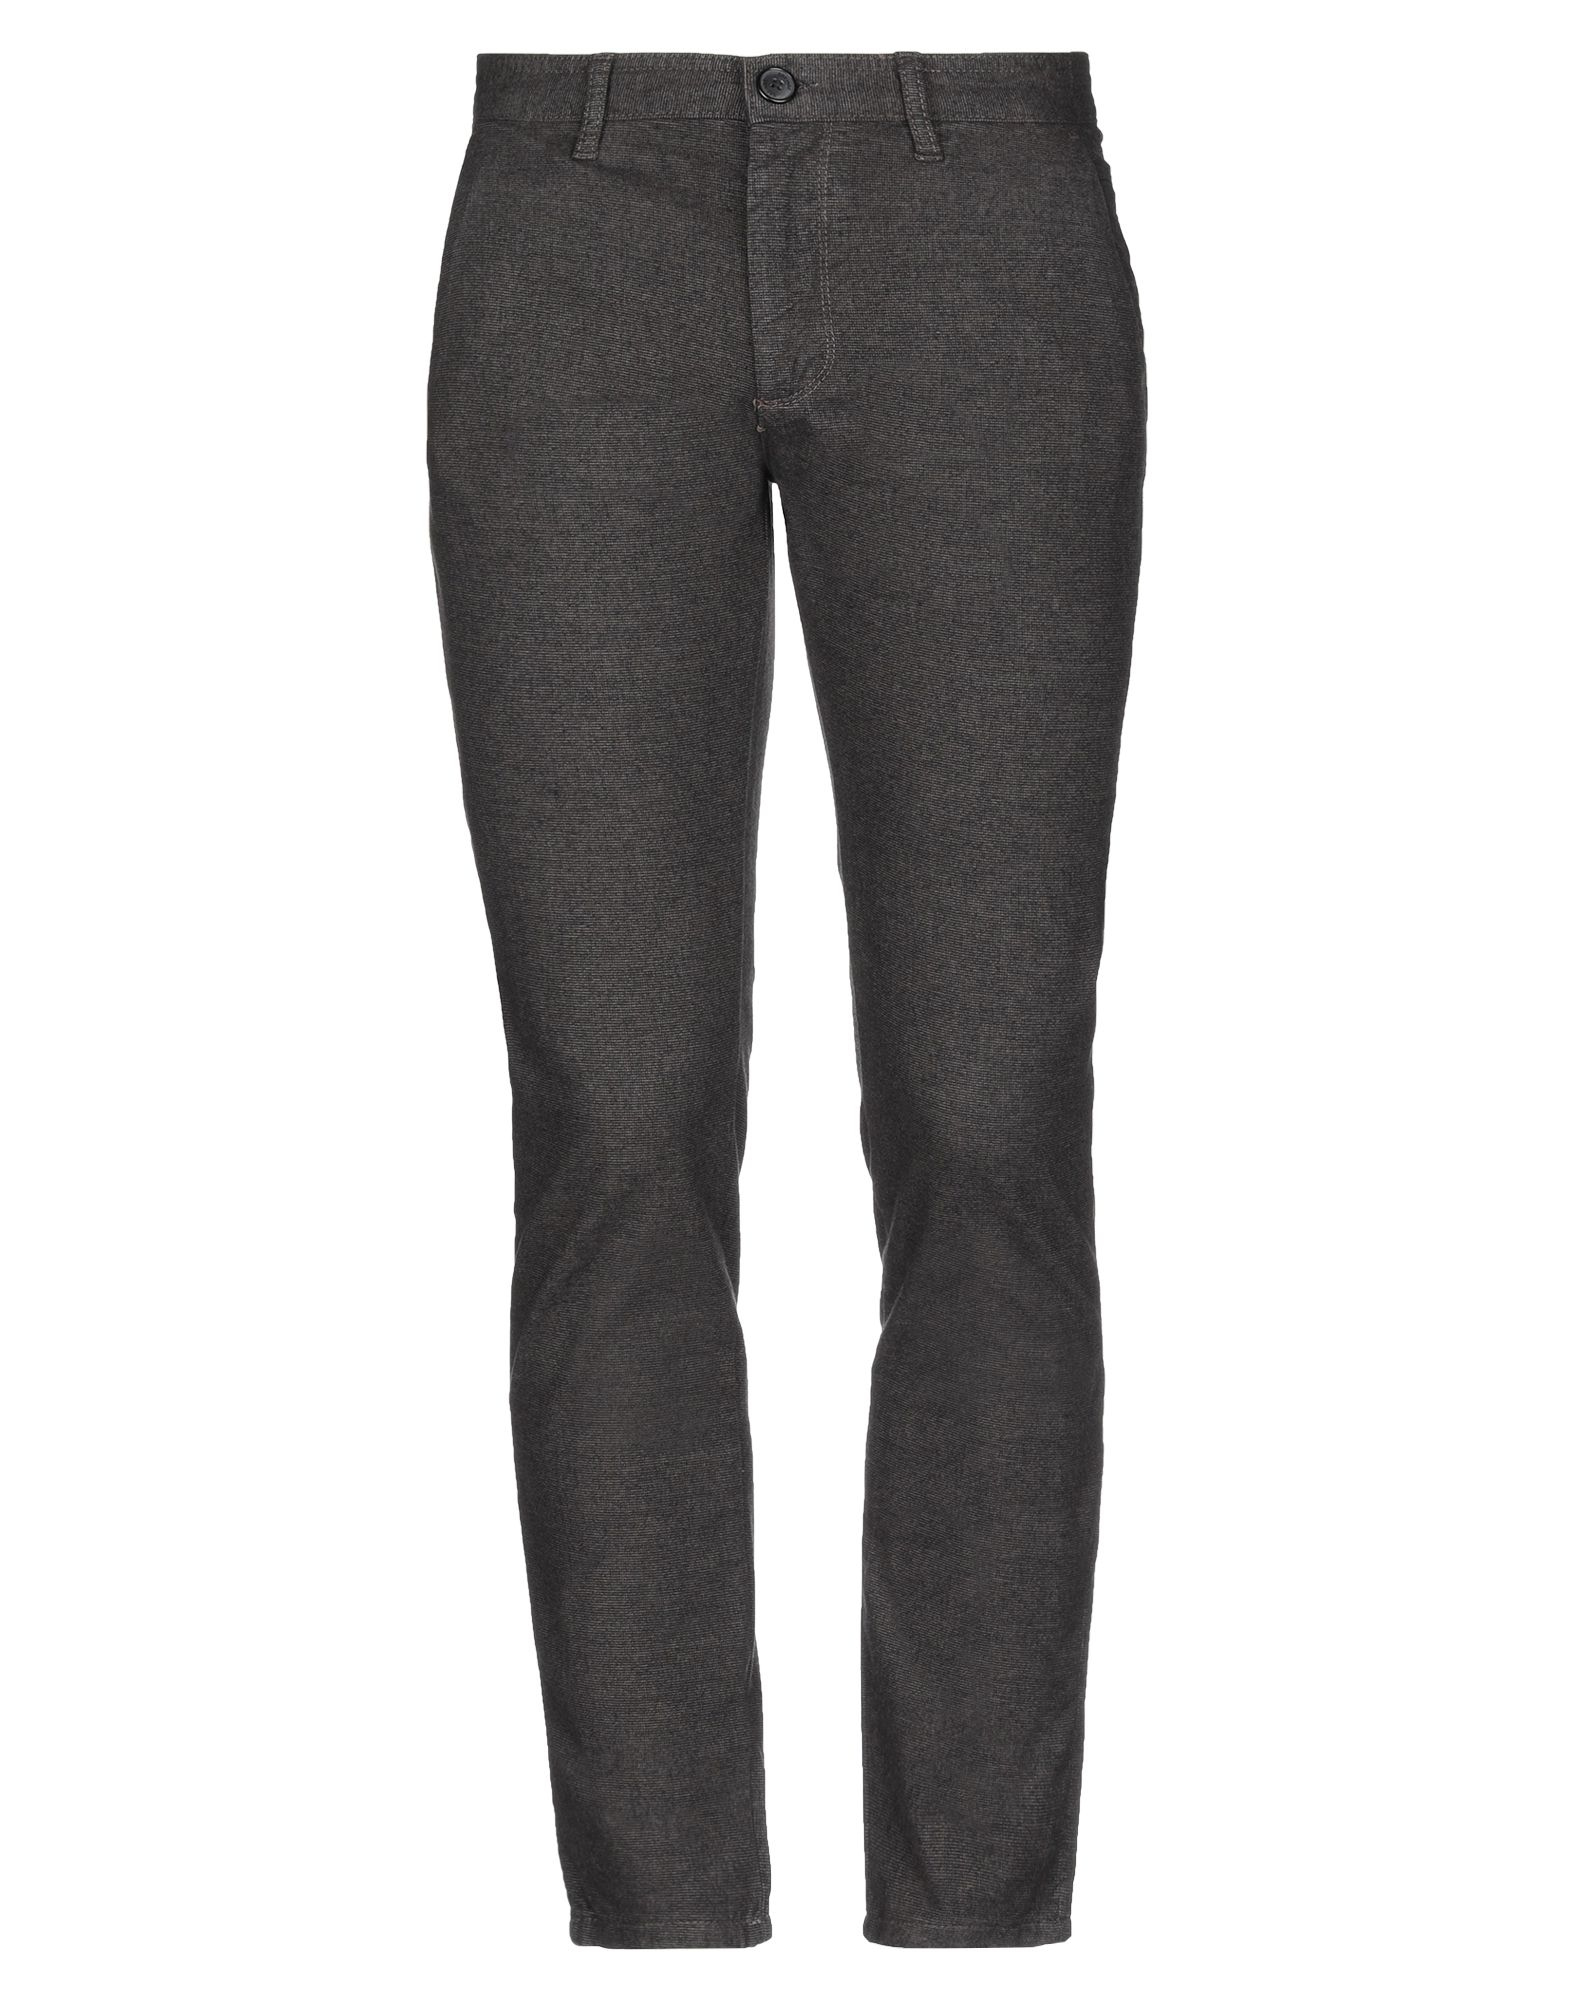 Pantalone Sseinse uomo - 13362855VJ 13362855VJ  70% günstiger